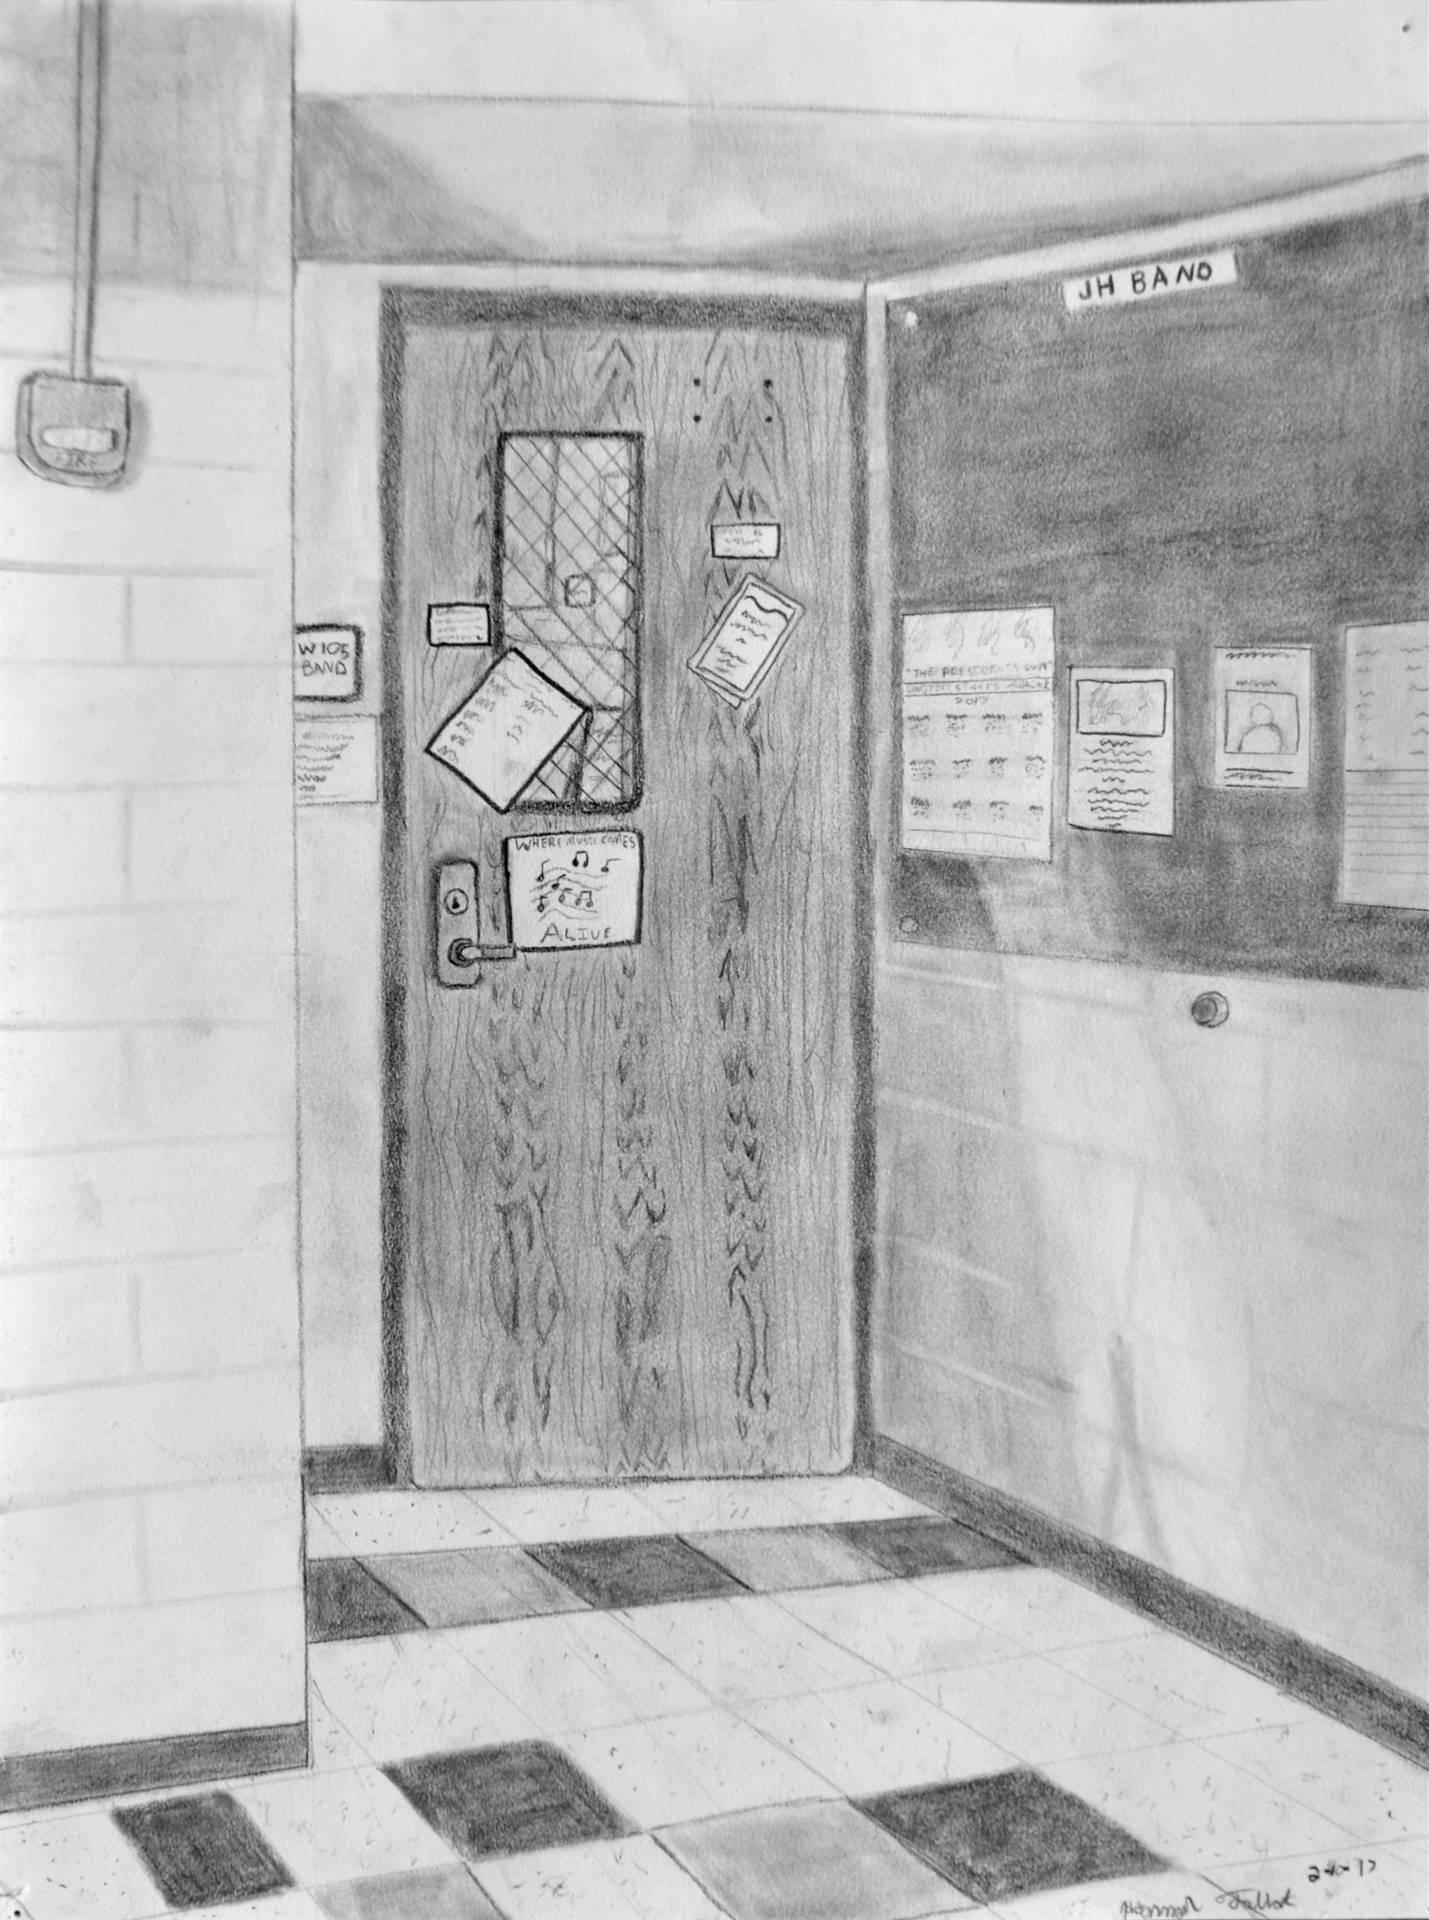 Hannah Talbot, Band Room Doorway, graphite, 12 x 9, 2017